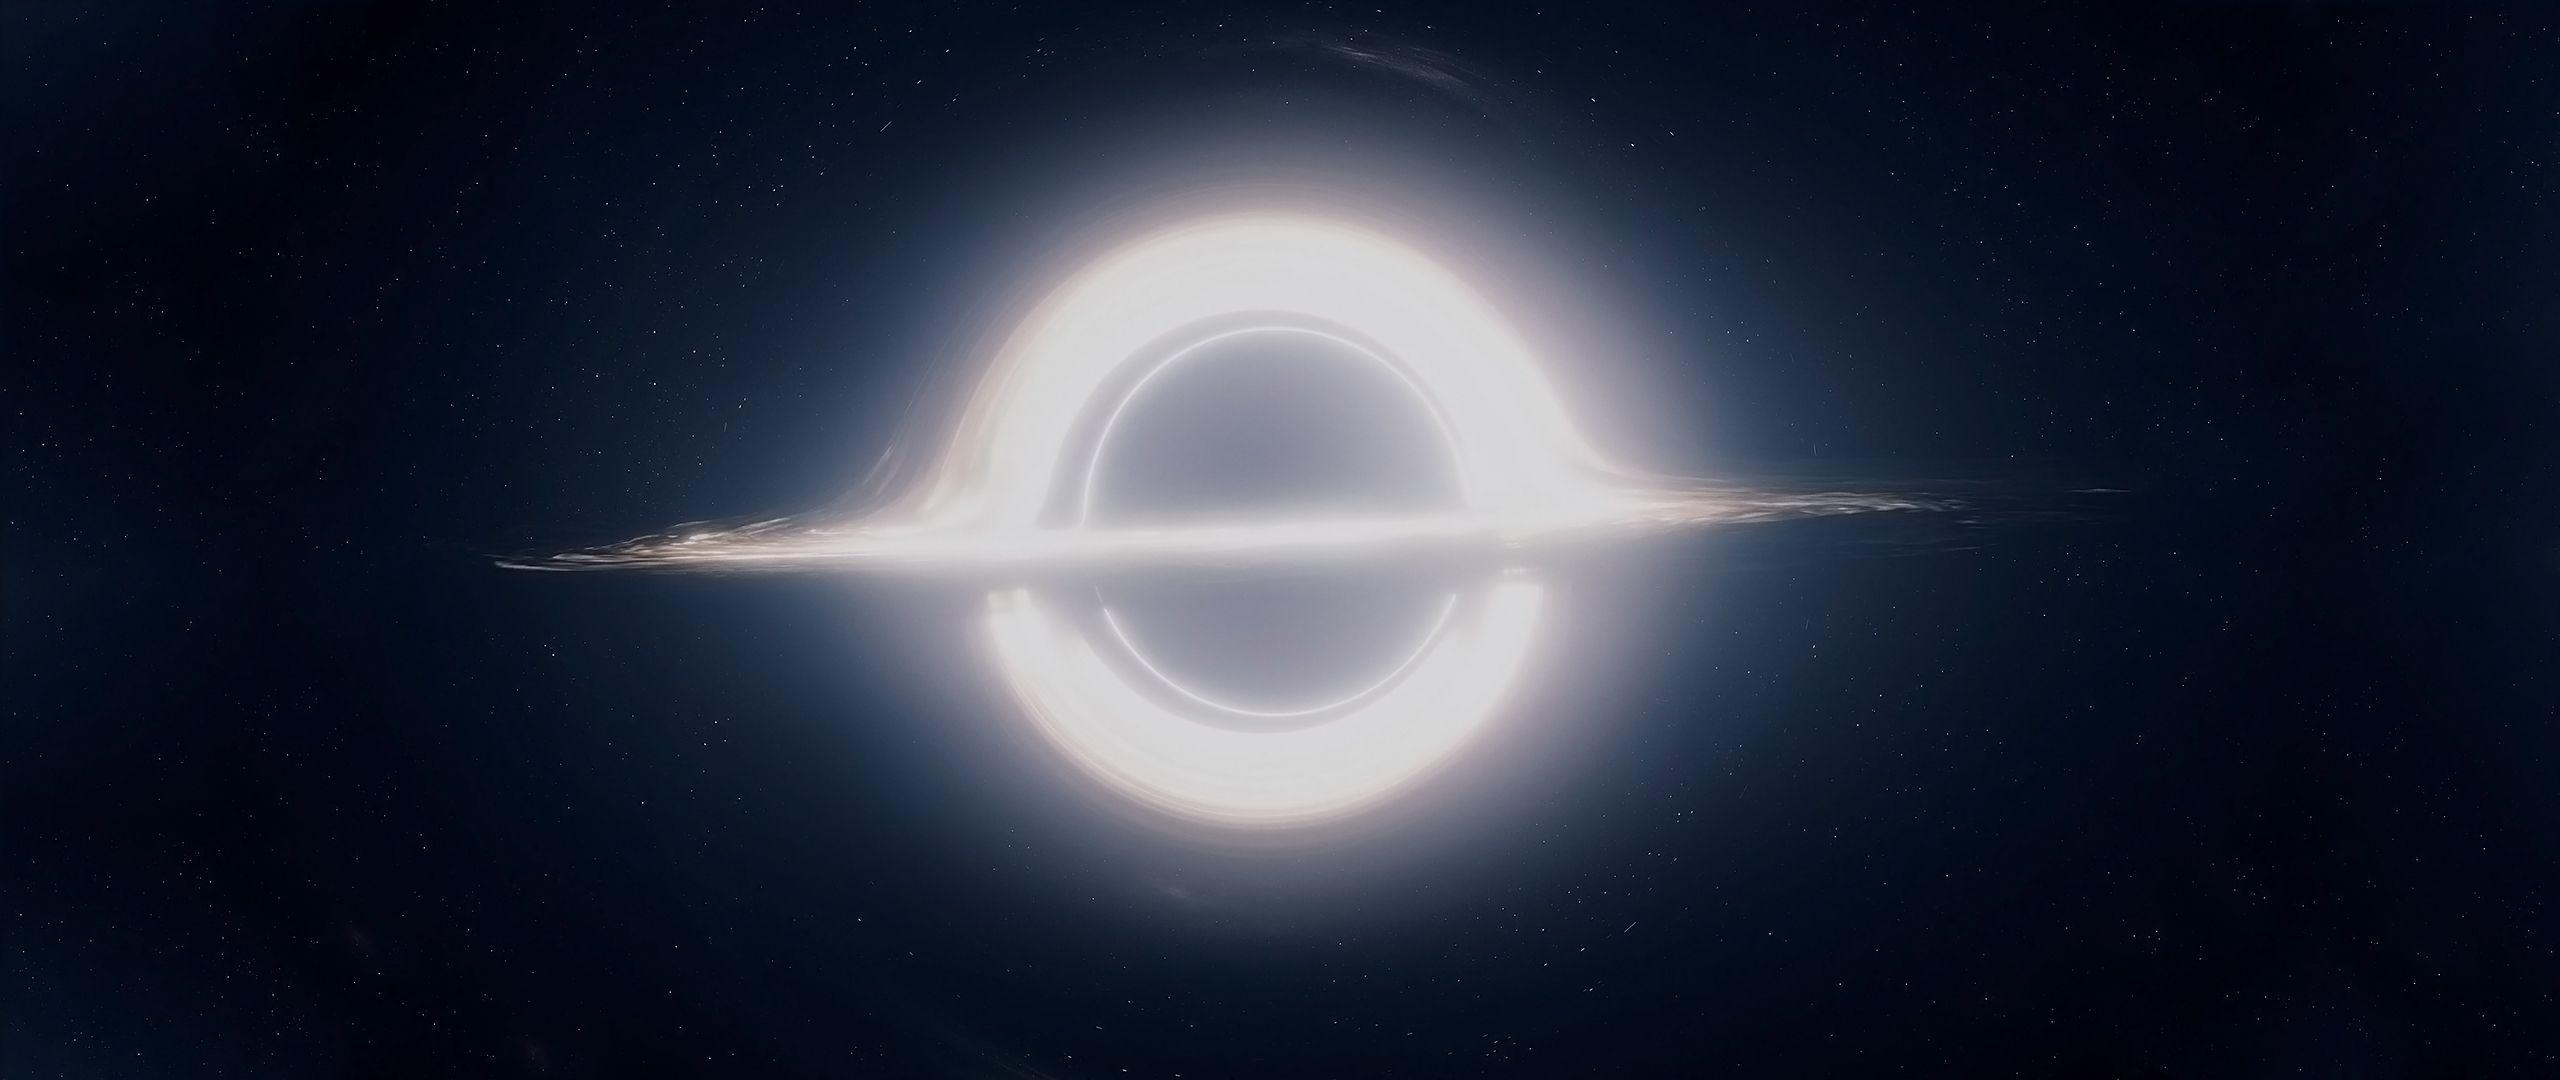 Interstellar Black Hole Gargantua Hd Desktop Wallpaper High 1920 1080 Wallpapers Black Hole 40 Wallpapers Ad Black Hole Wallpaper Black Hole Interstellar